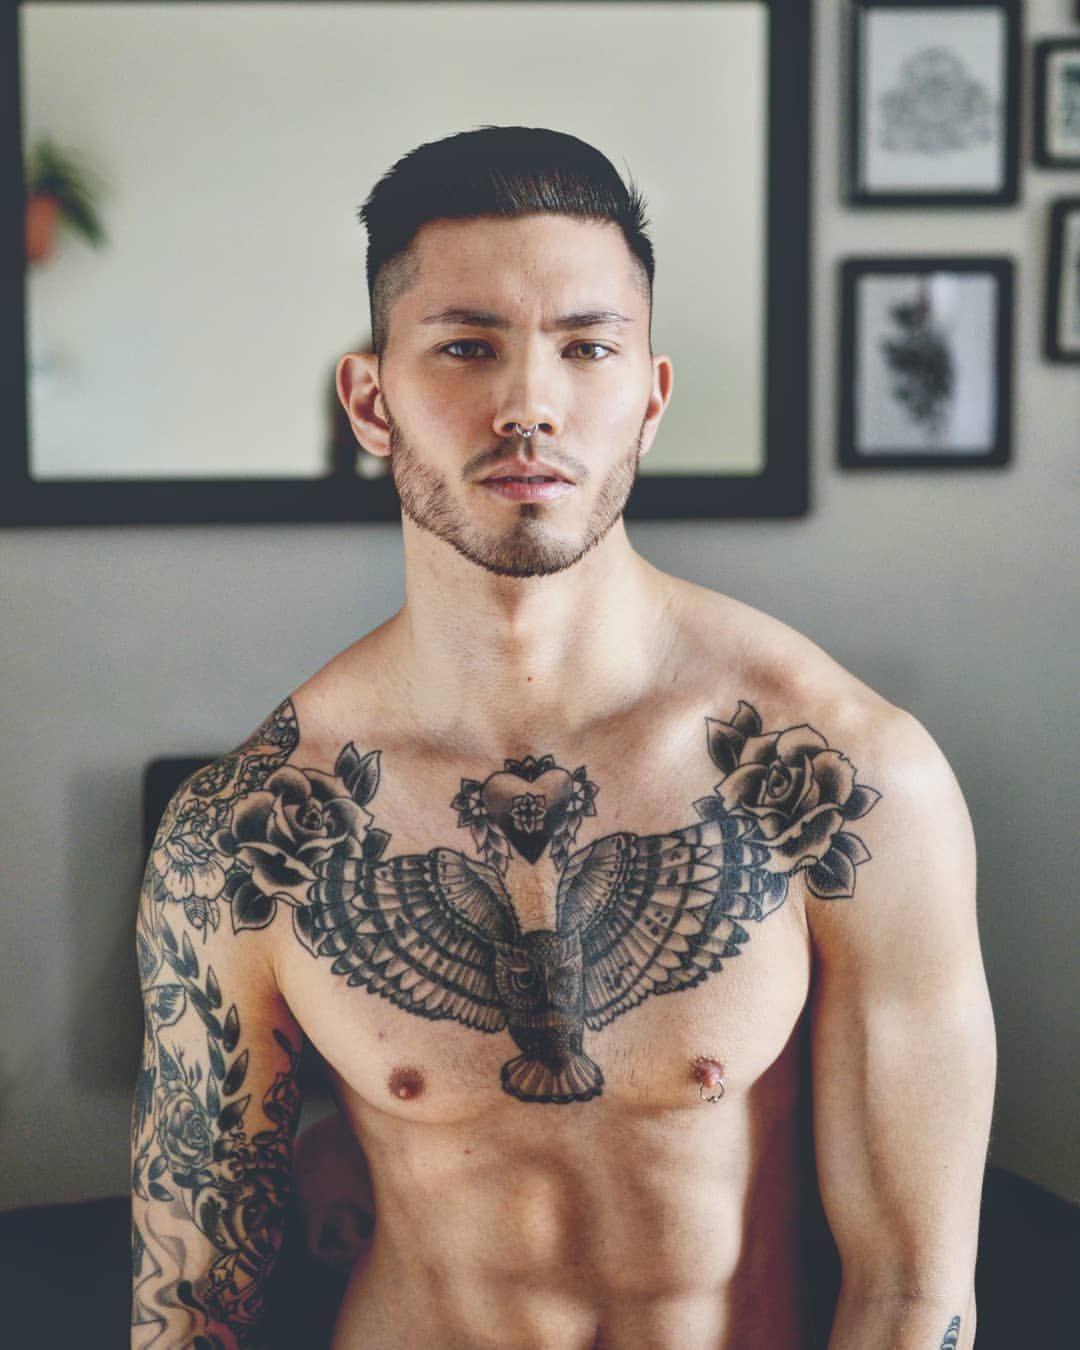 Stevotrann Sur Instagram Chest Tattoo Men Boy Tattoos Tattoos For Guys